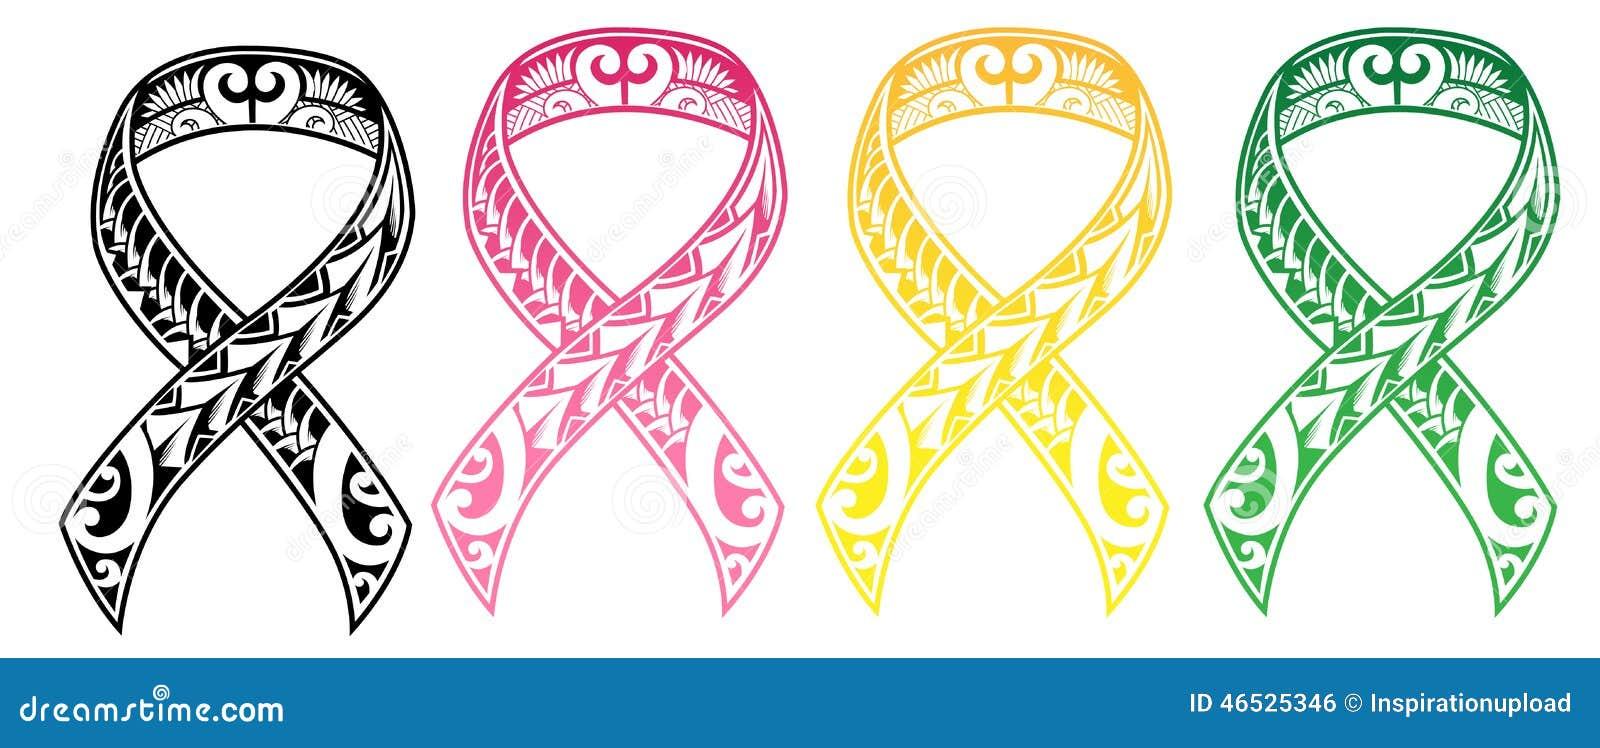 Tribal Cancer Ribbon Stock Vector Illustration Of Human 46525346